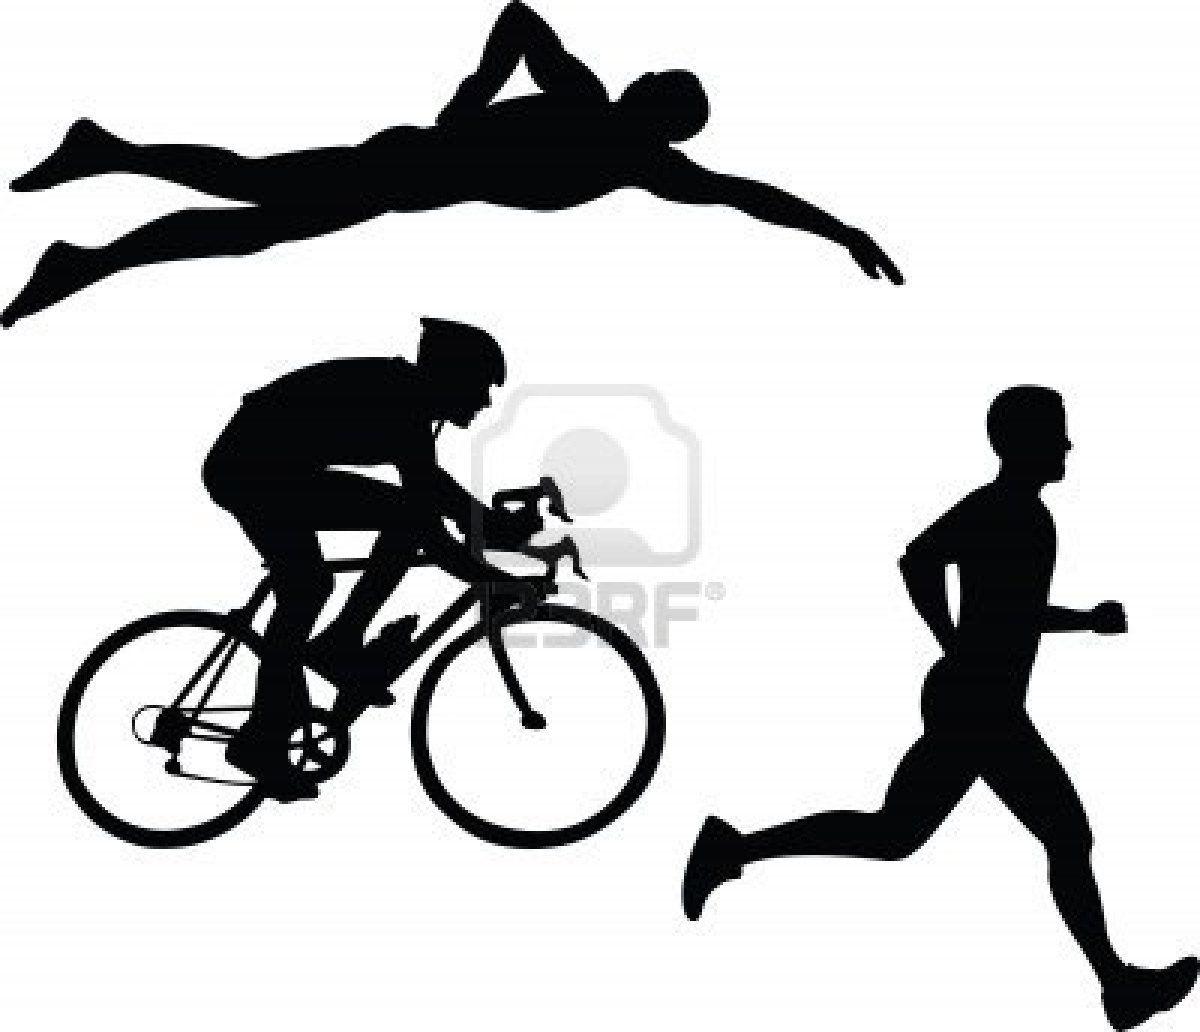 triatlon - Buscar con Google